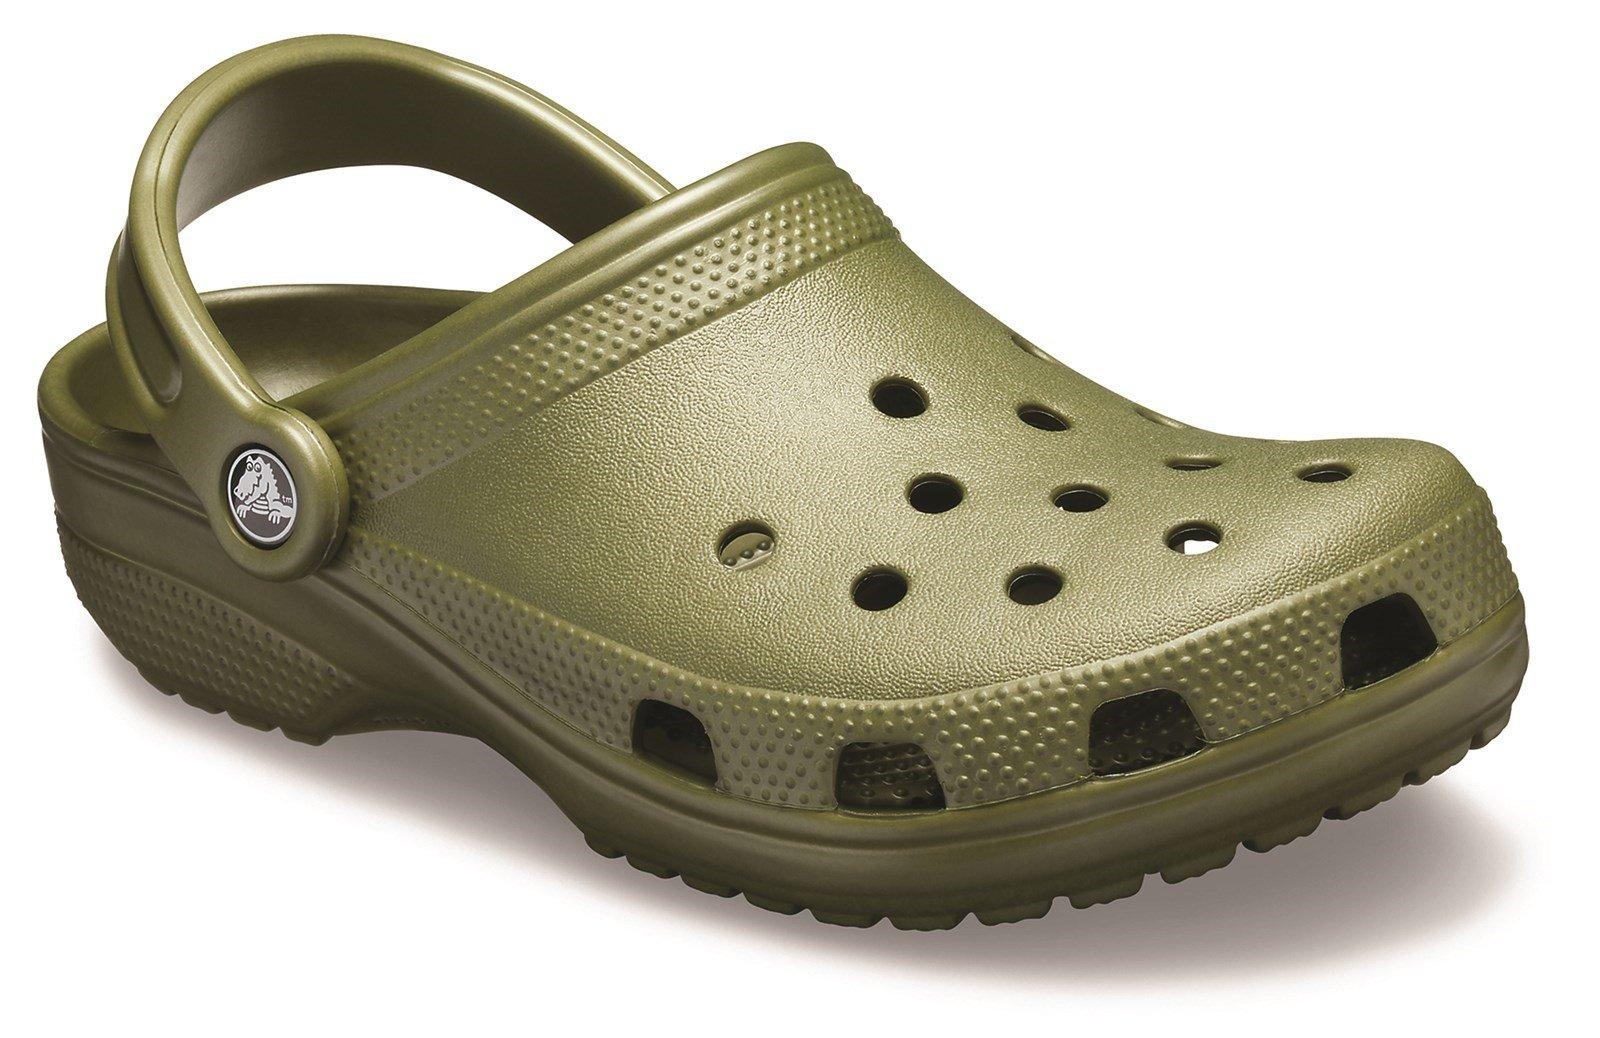 Crocs Unisex Classic Clog Sandal Various Colours 21060 - Army Green 5